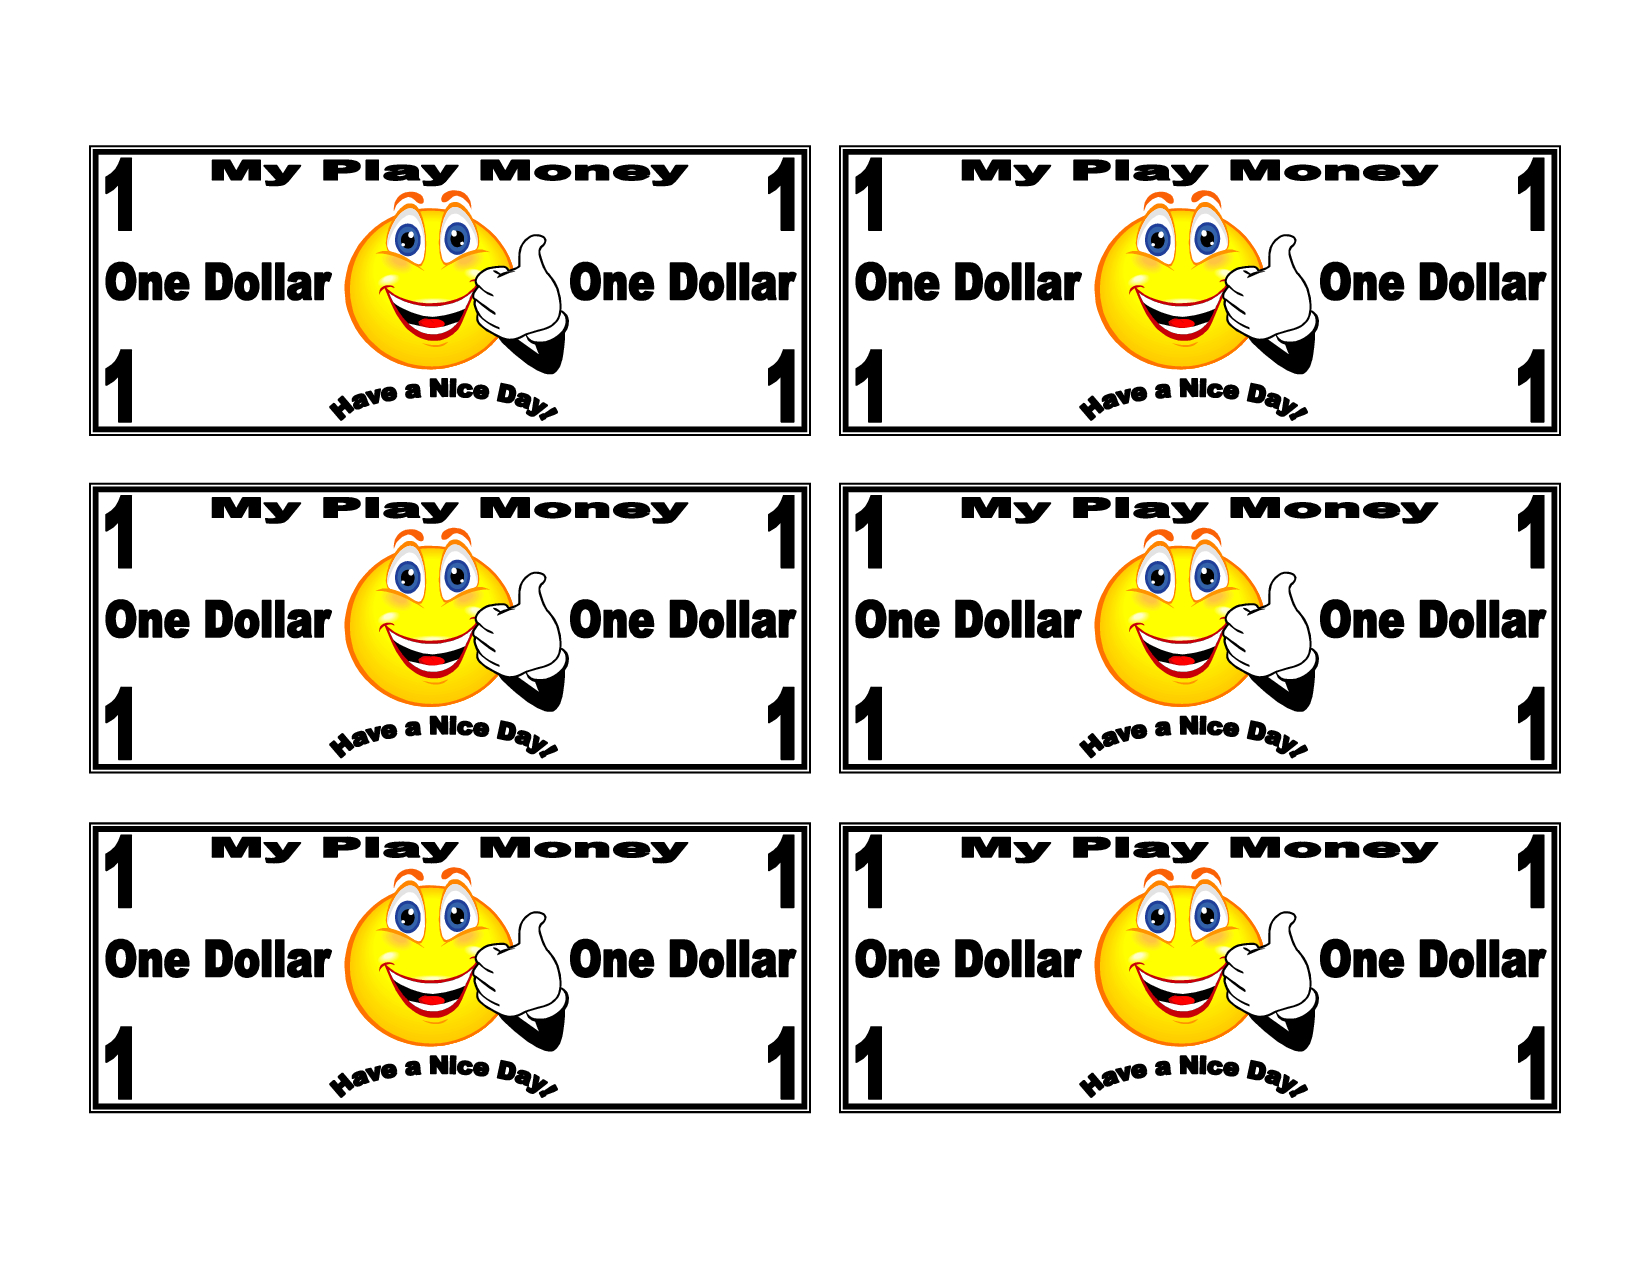 Free Printable Play Money | Printable Money Template Play Money Kids - Free Printable Money For Kids